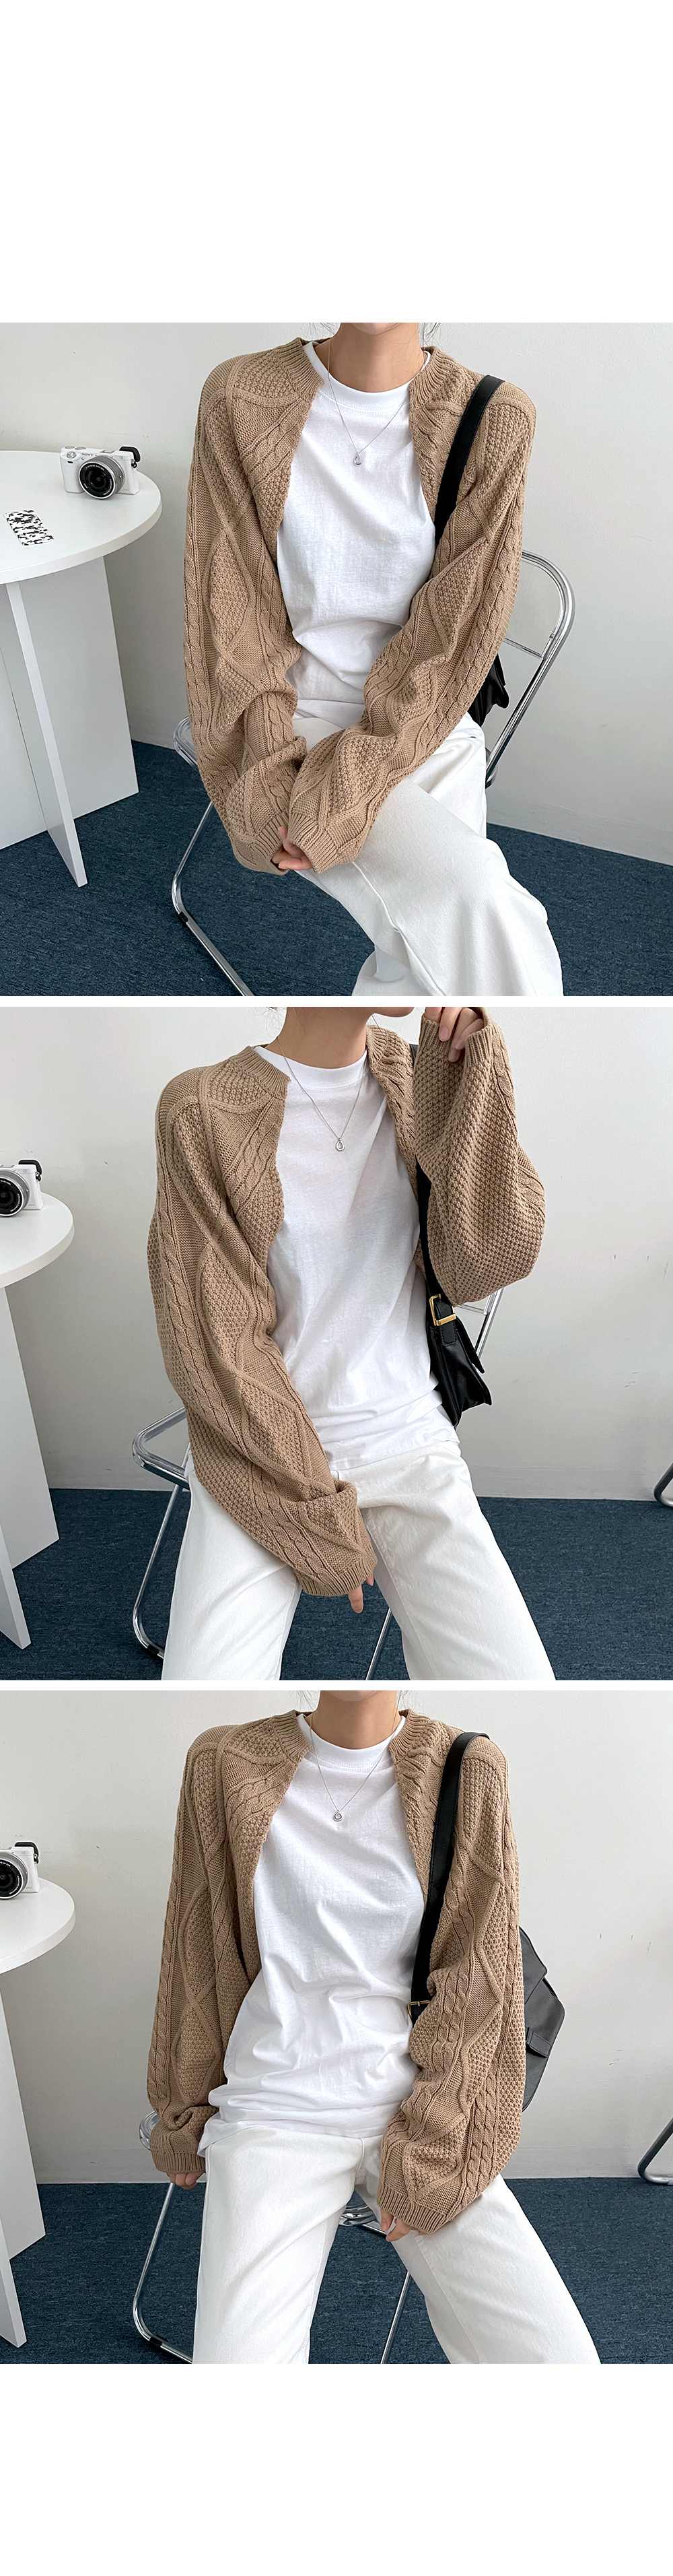 Twisted bolero cardigan